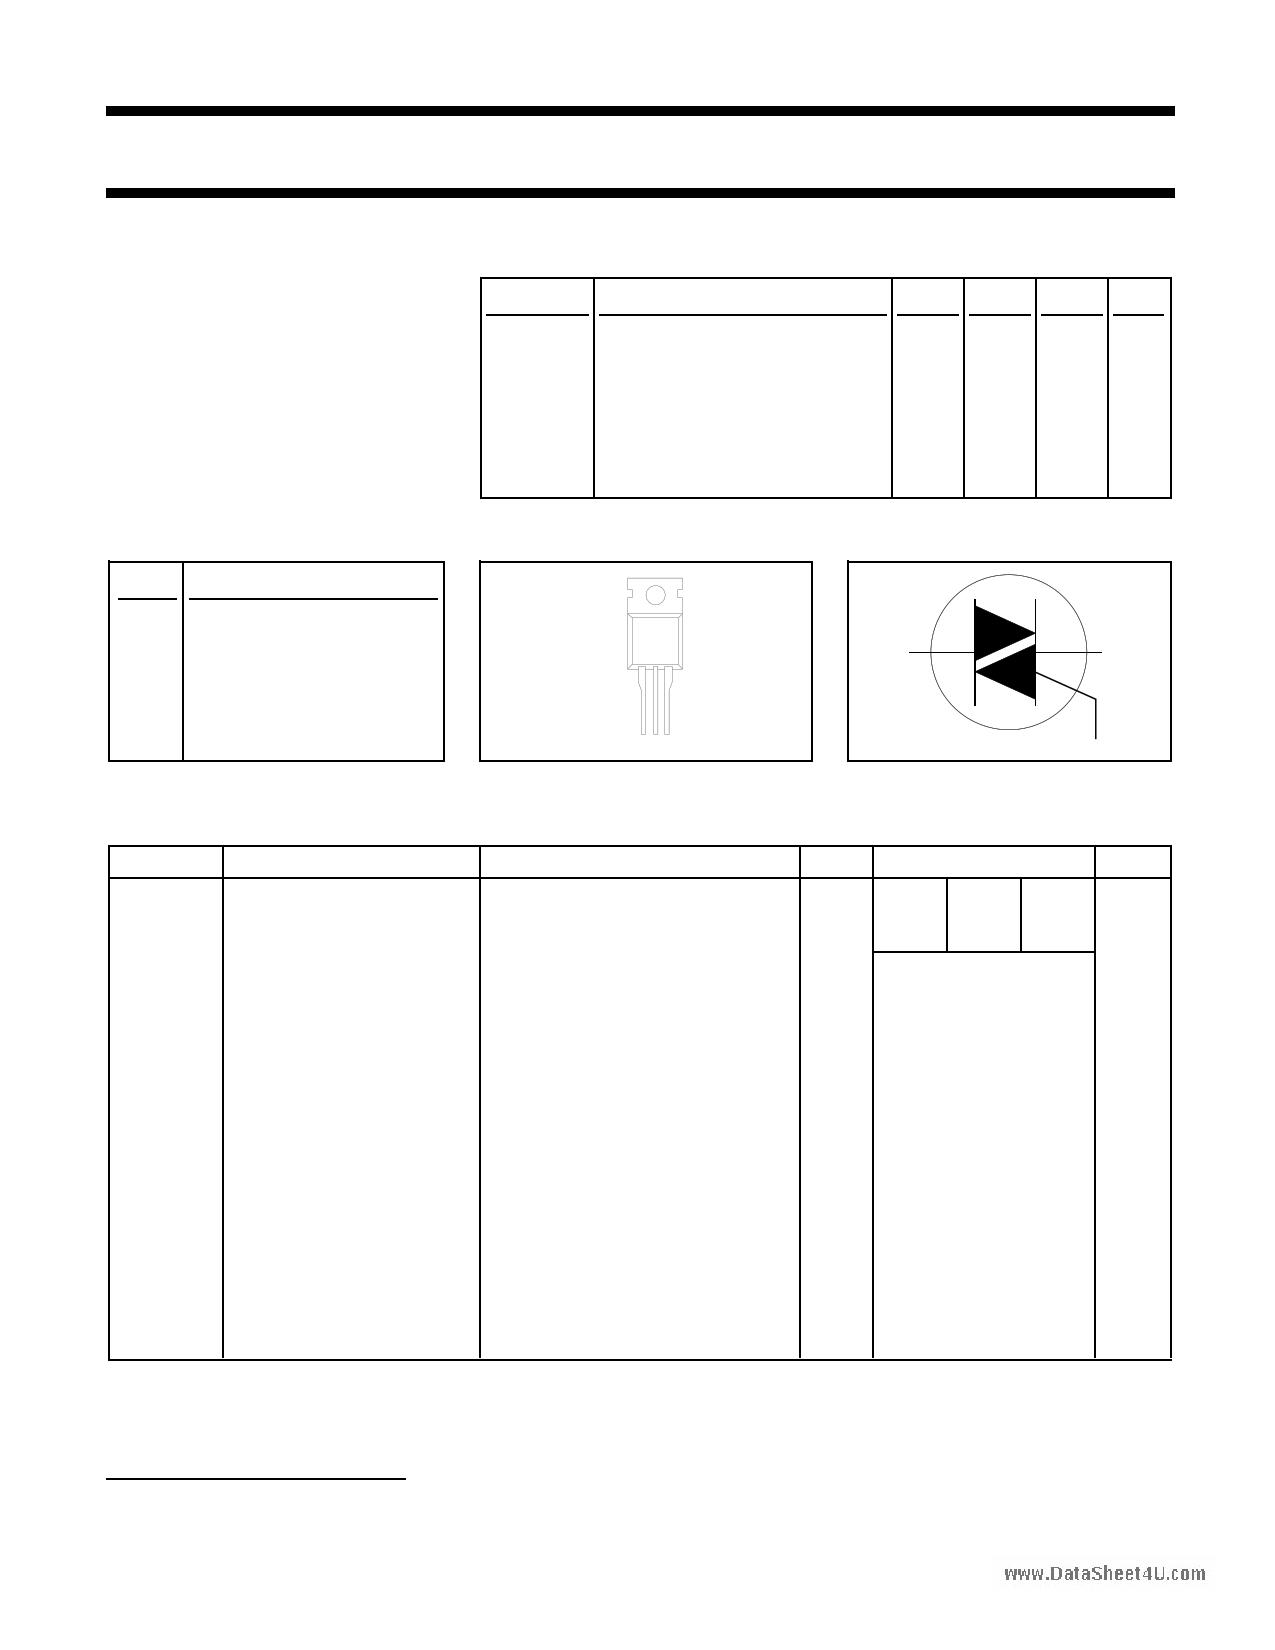 BT-139 دیتاشیت PDF